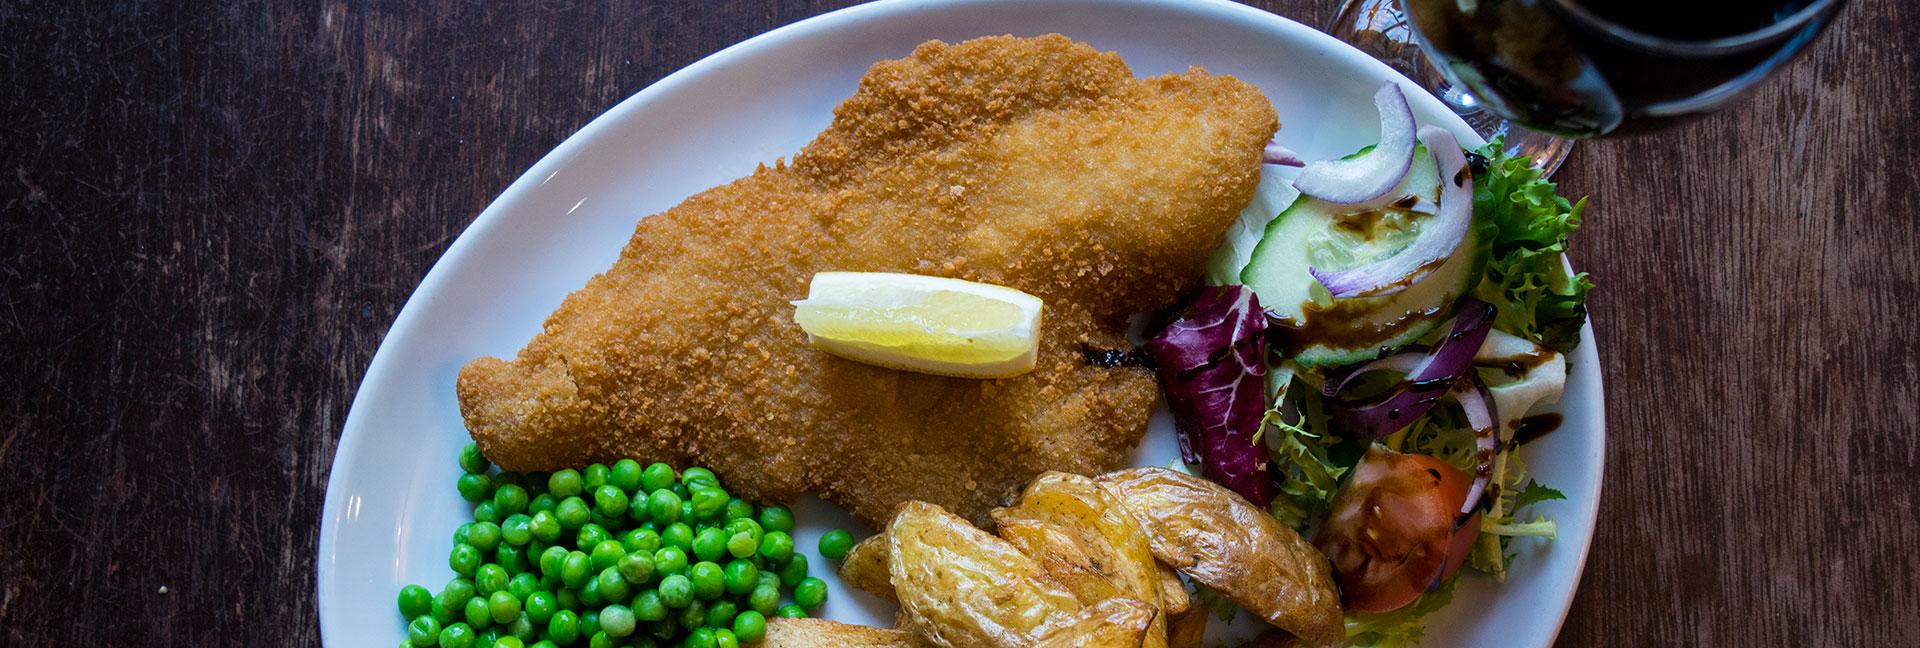 Fish Menu at The Open Hearth Pub & Restaurant, Pontypool